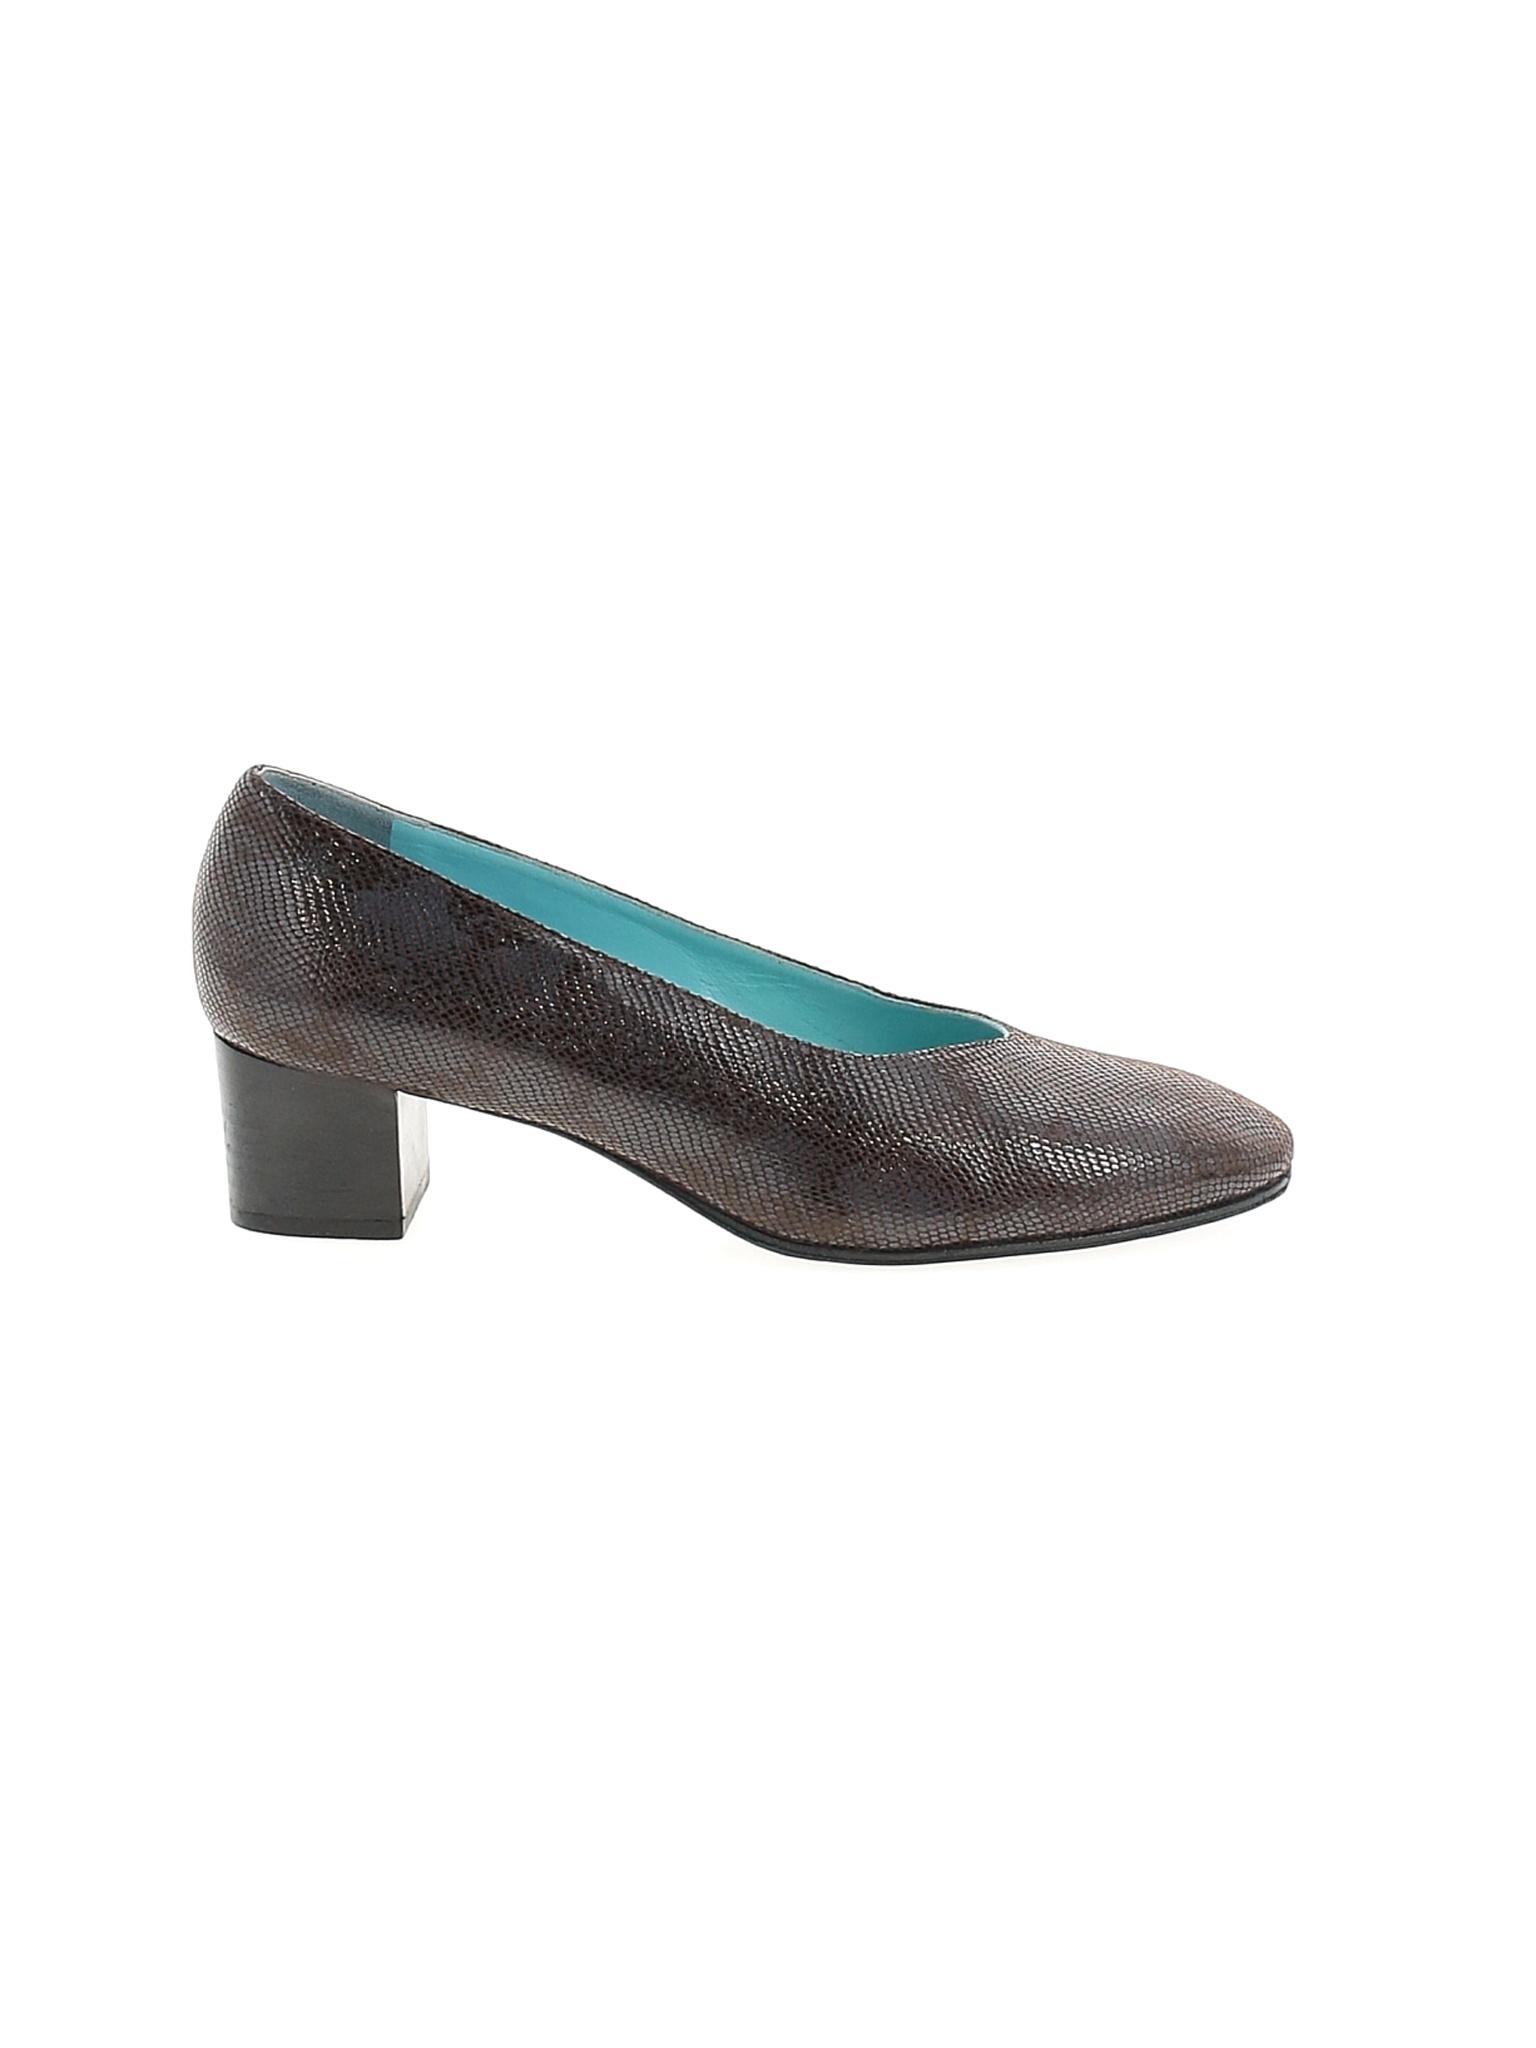 Thierry Rabotin Women's Shoes On Sale